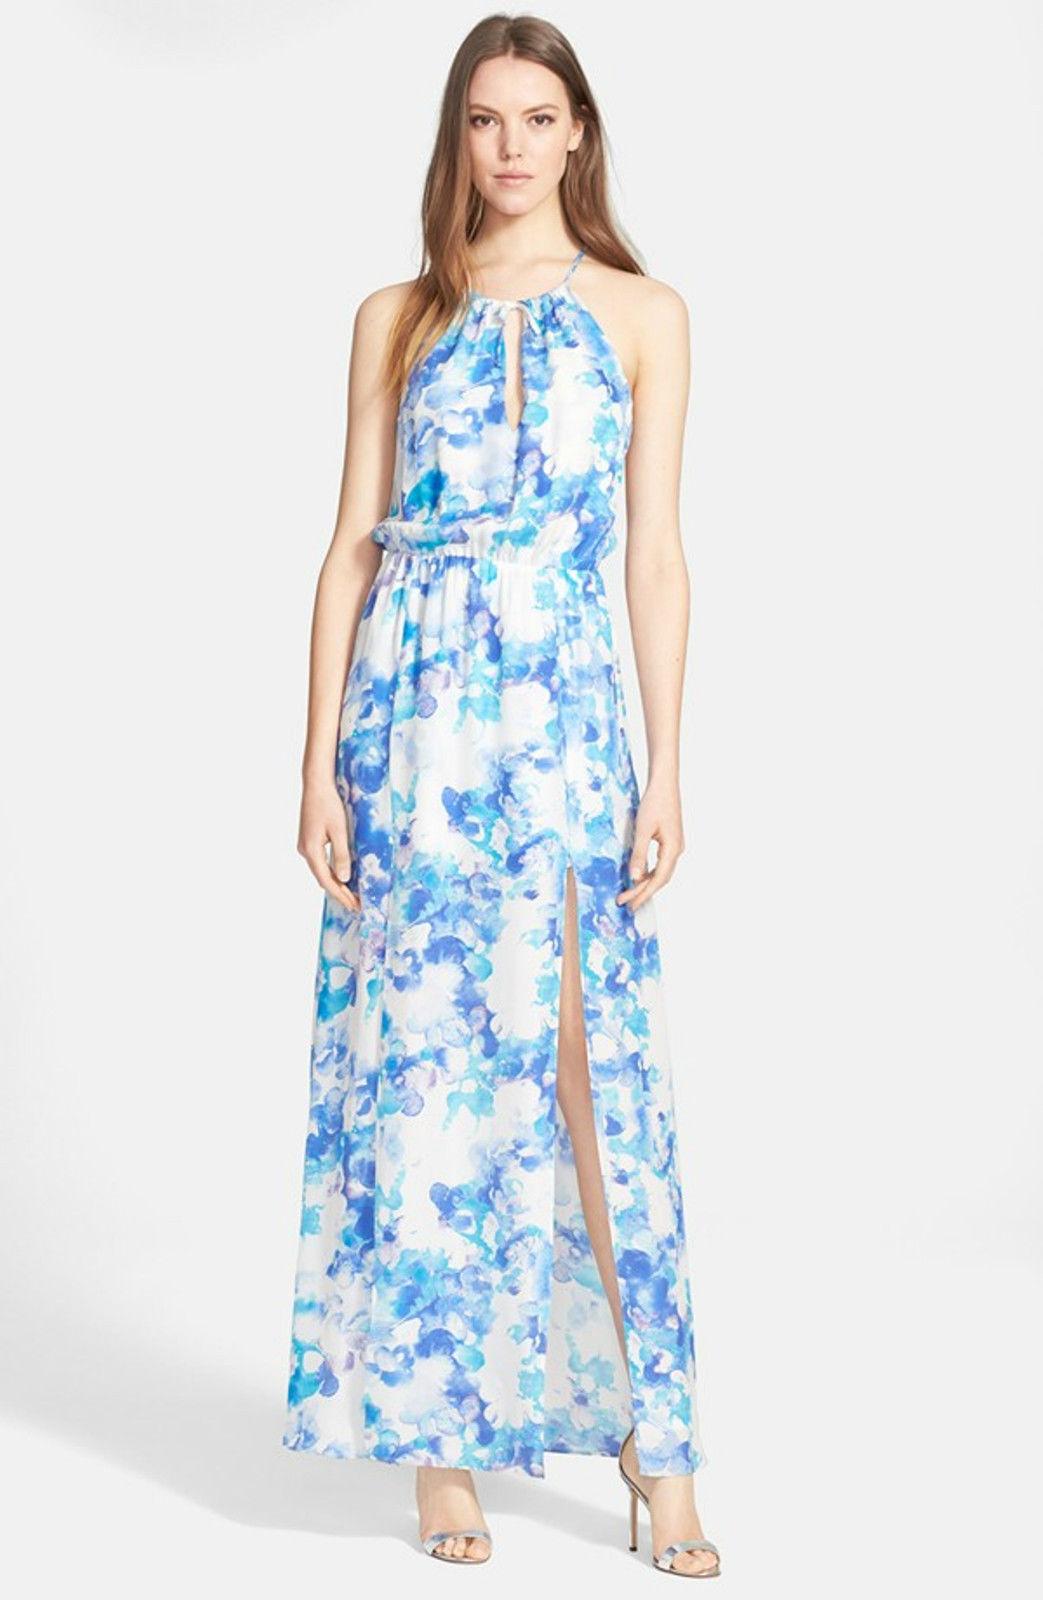 308 NWT Parker 100% Silk bluee White Lisbon Maxi Dress, Sz M  NWT MSRP  308